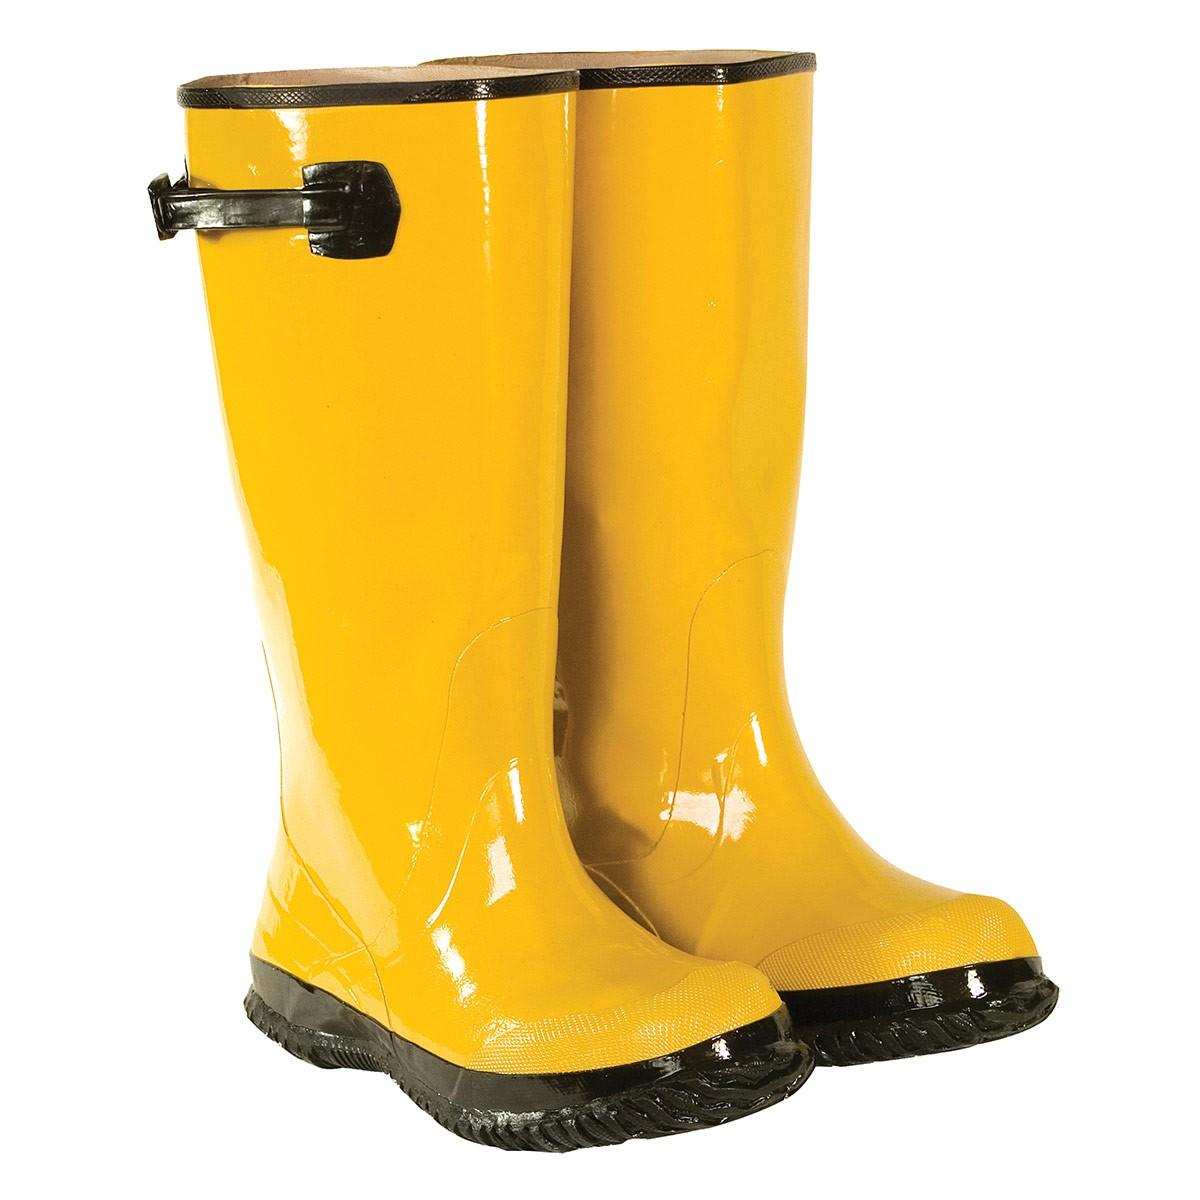 rain boot custom leather craft slush/rain boots - r200 DNMDPLO